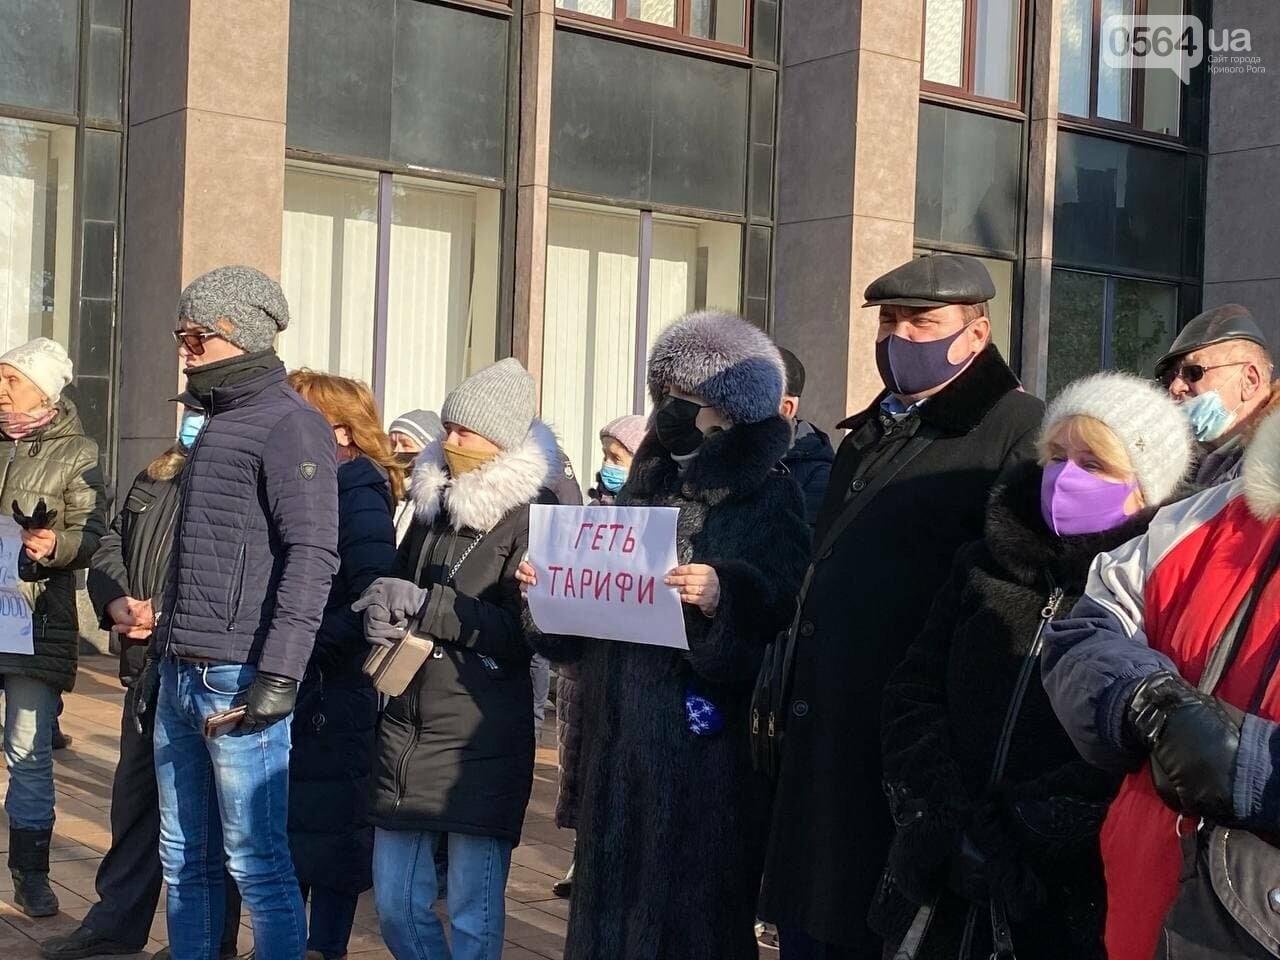 "Криворожане вышли на митинг против ""тарифного геноцида"", - ФОТО, ВИДЕО (ДОПОЛНЕНО), фото-25"